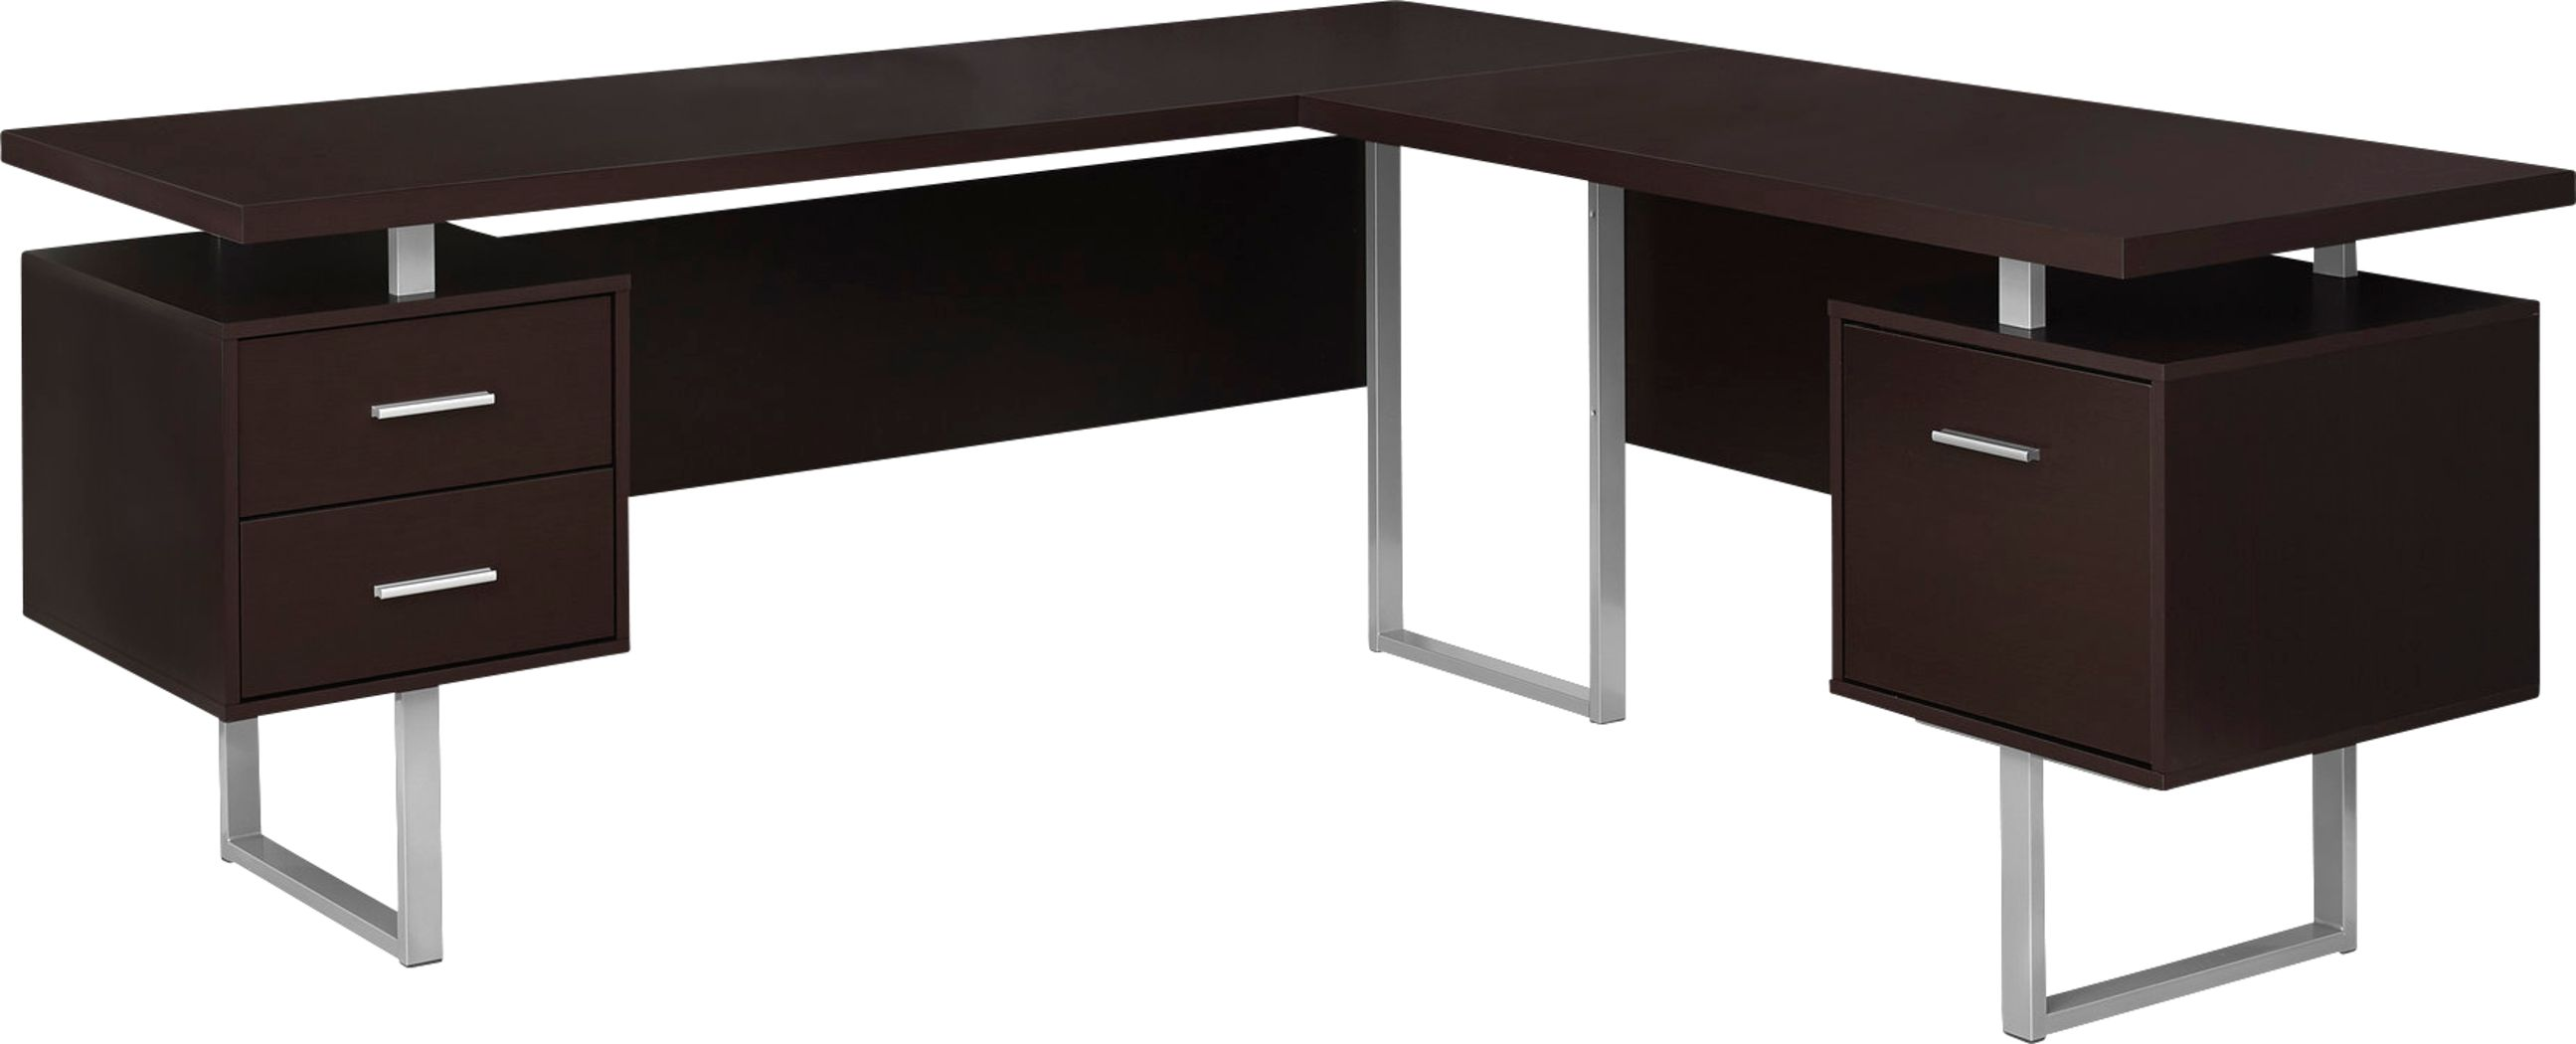 Wellyn Cappuccino Desk